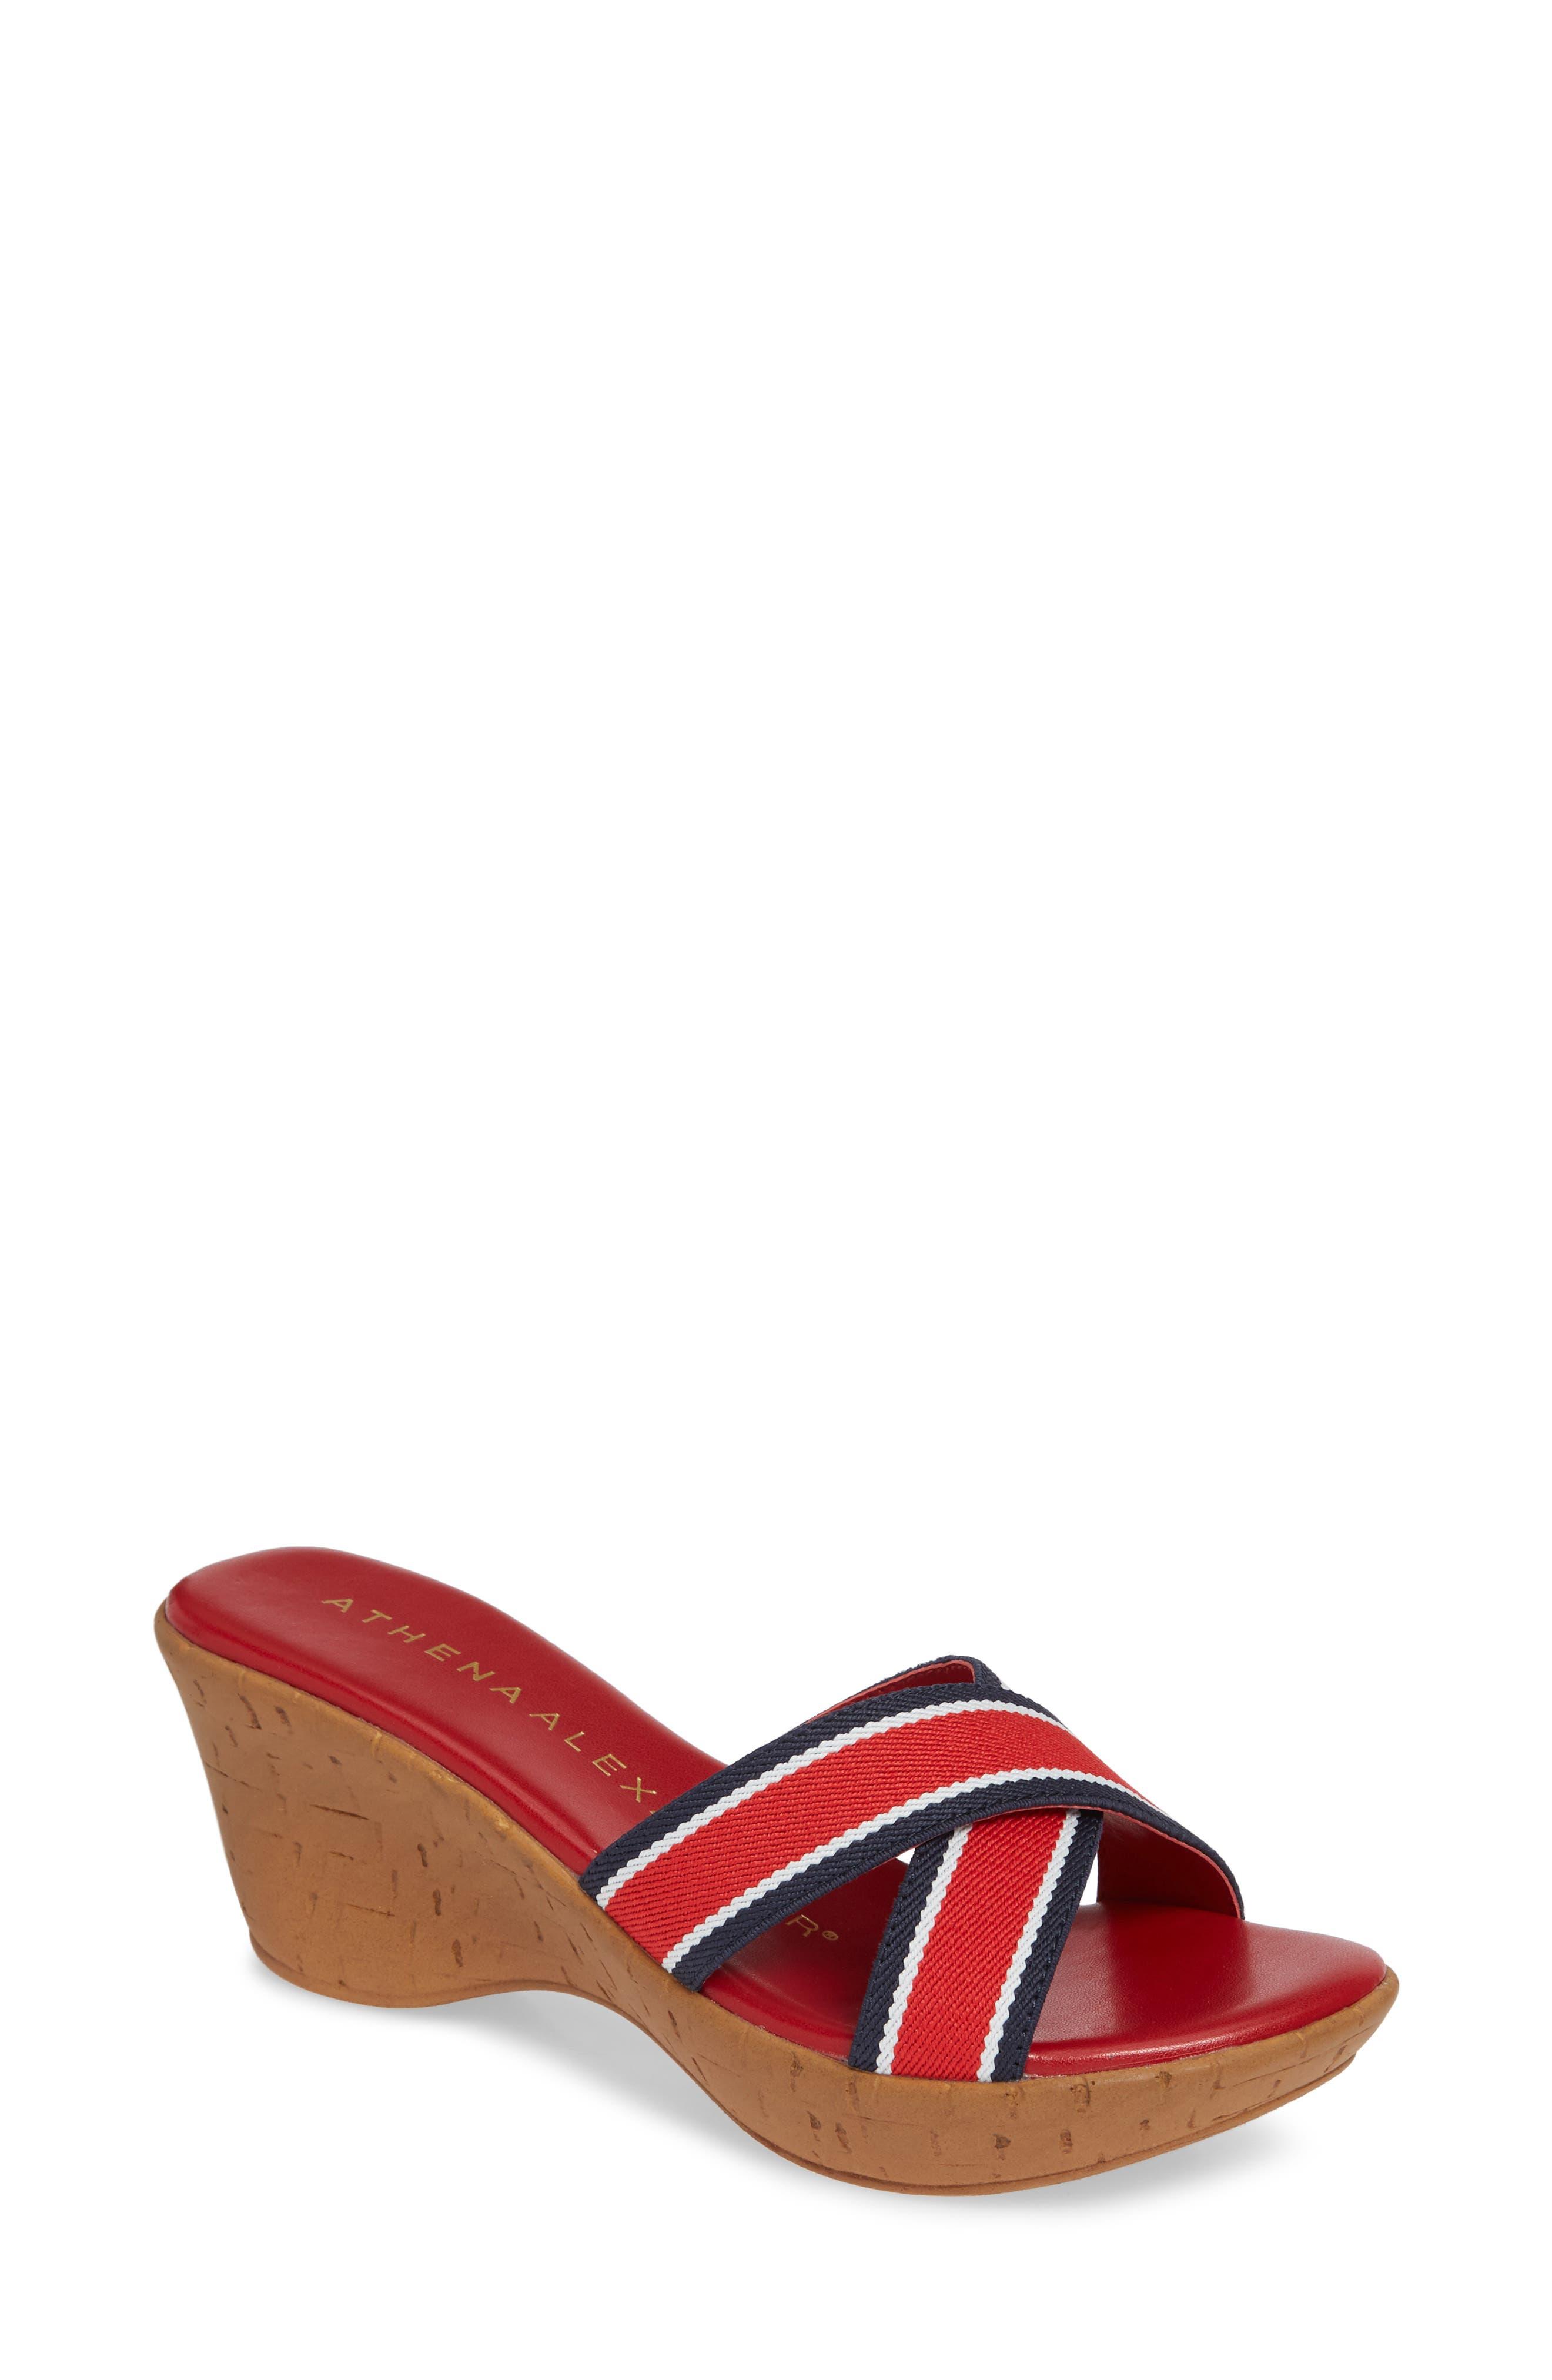 Athena Alexander Seymour Wedge Slide Sandal, Red